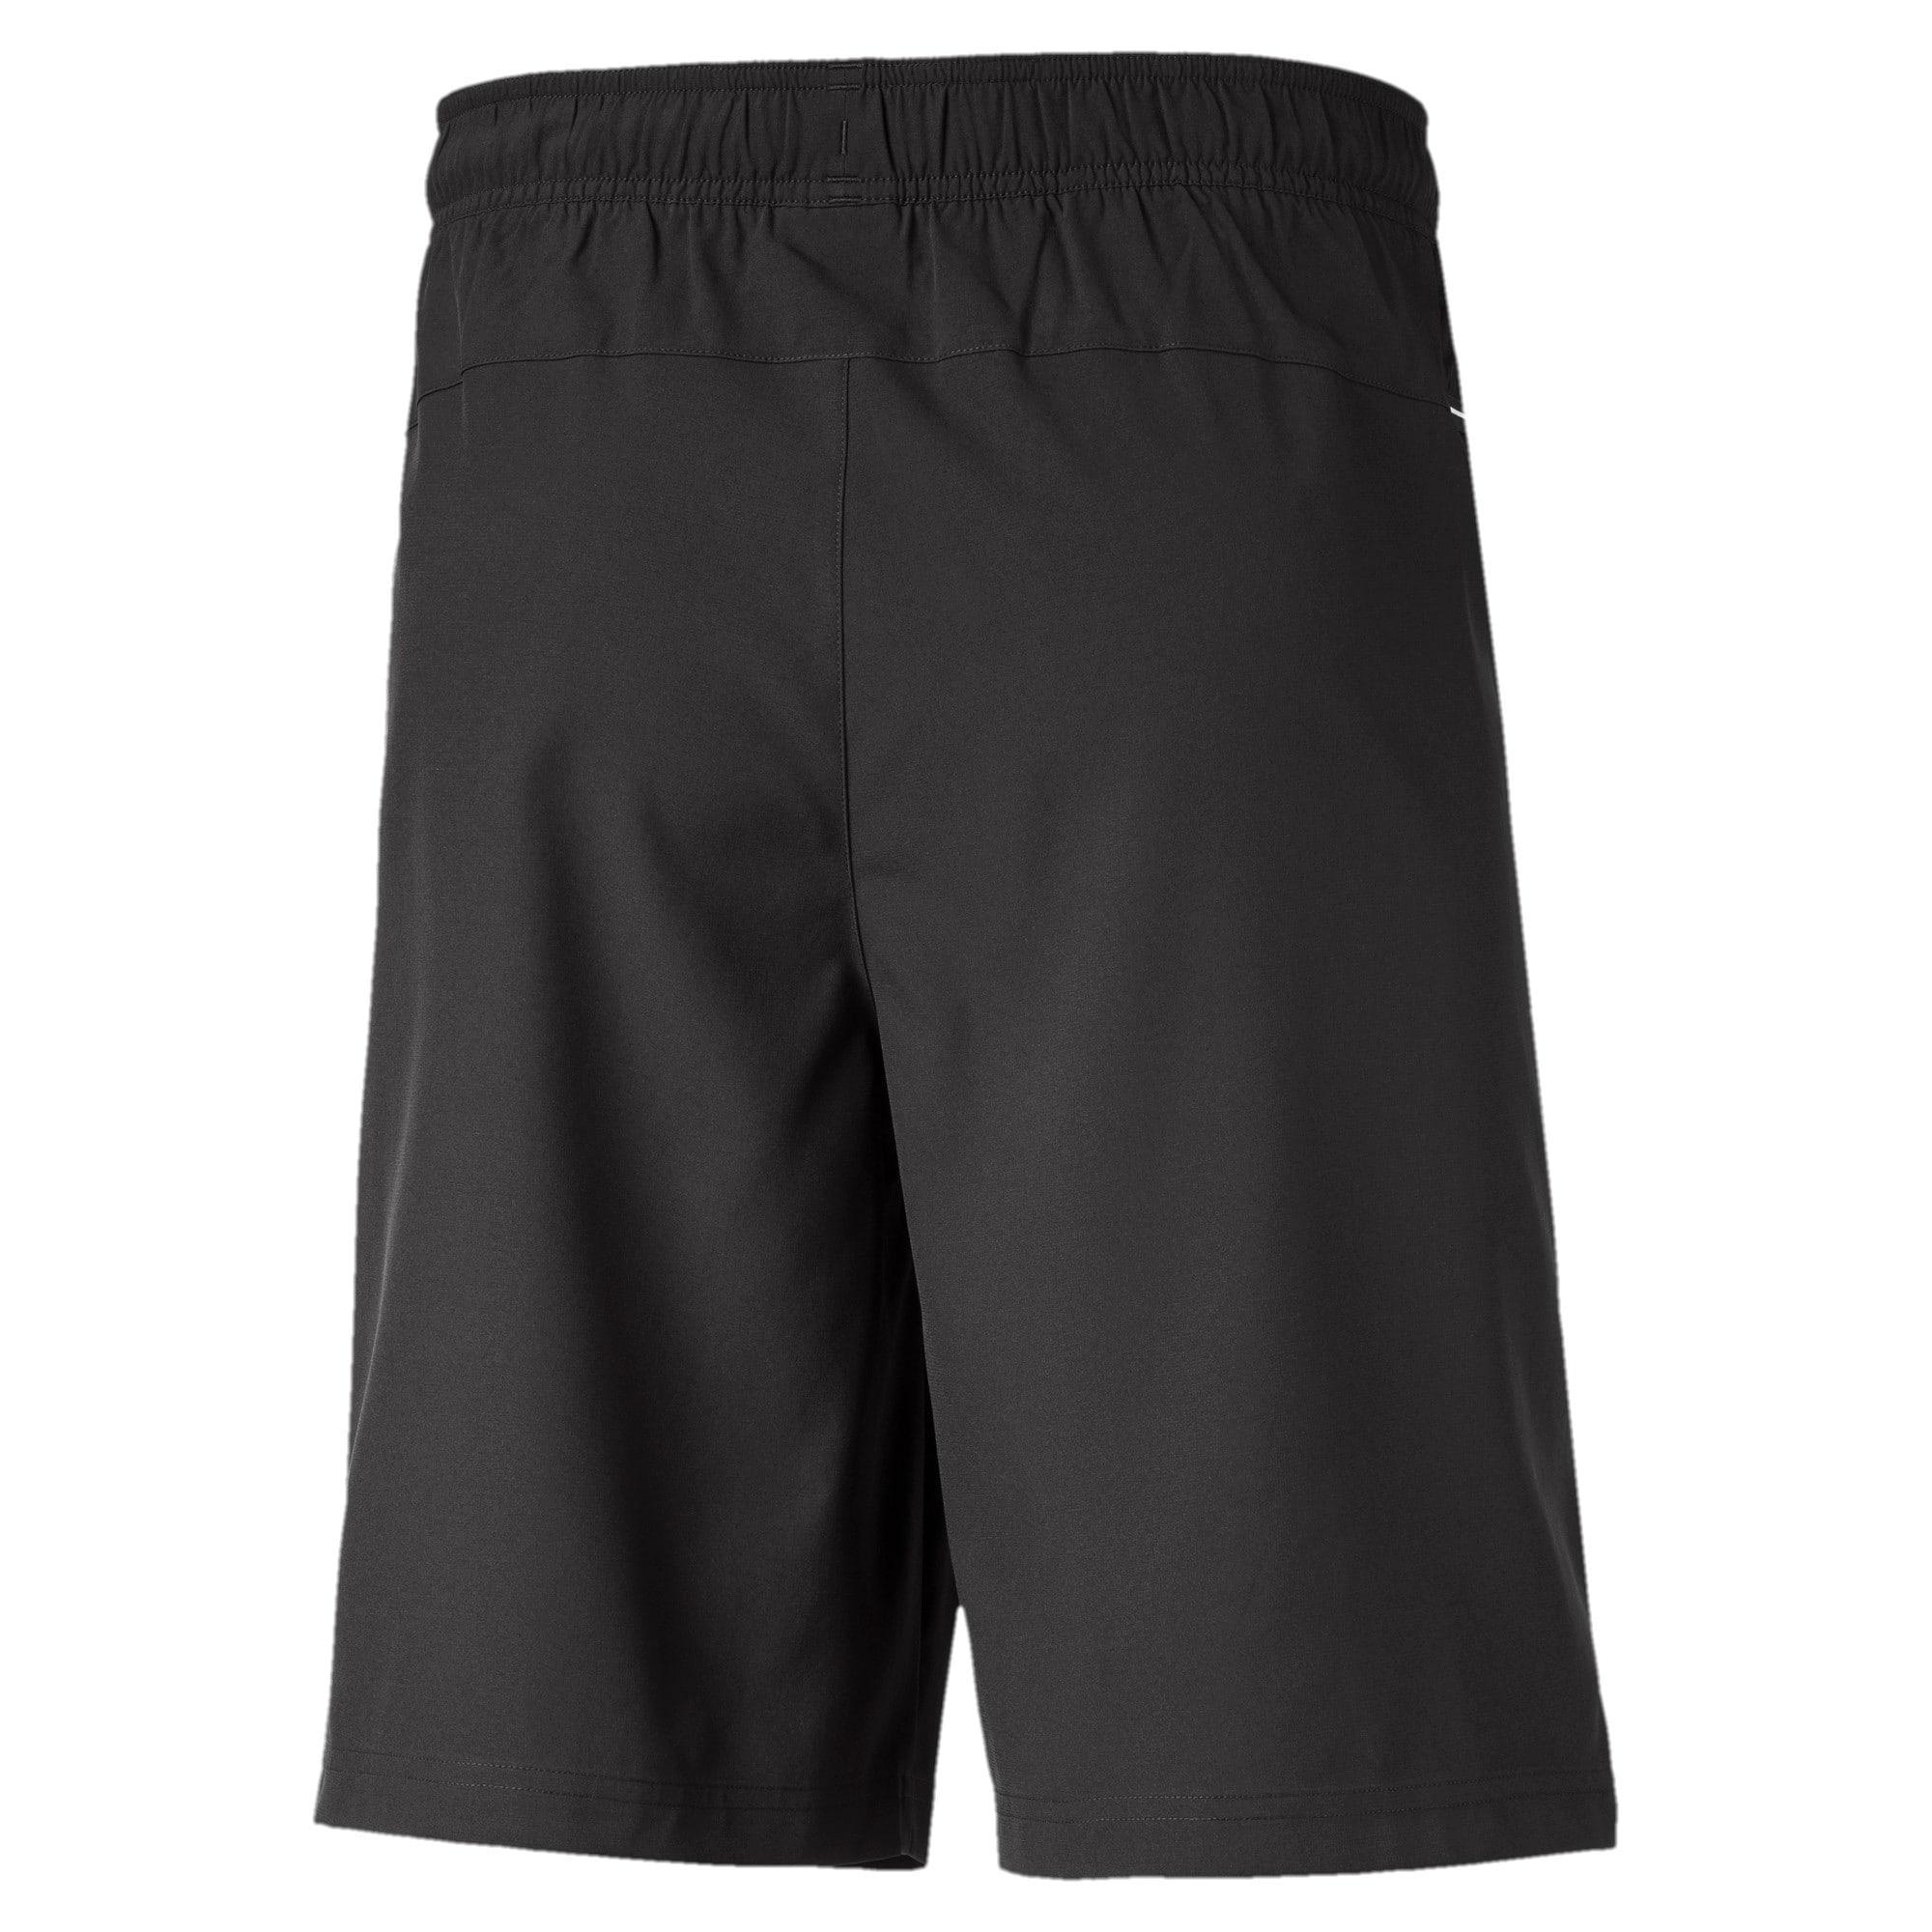 Thumbnail 5 of Tec Sports Men's Woven Shorts, Puma Black, medium-IND